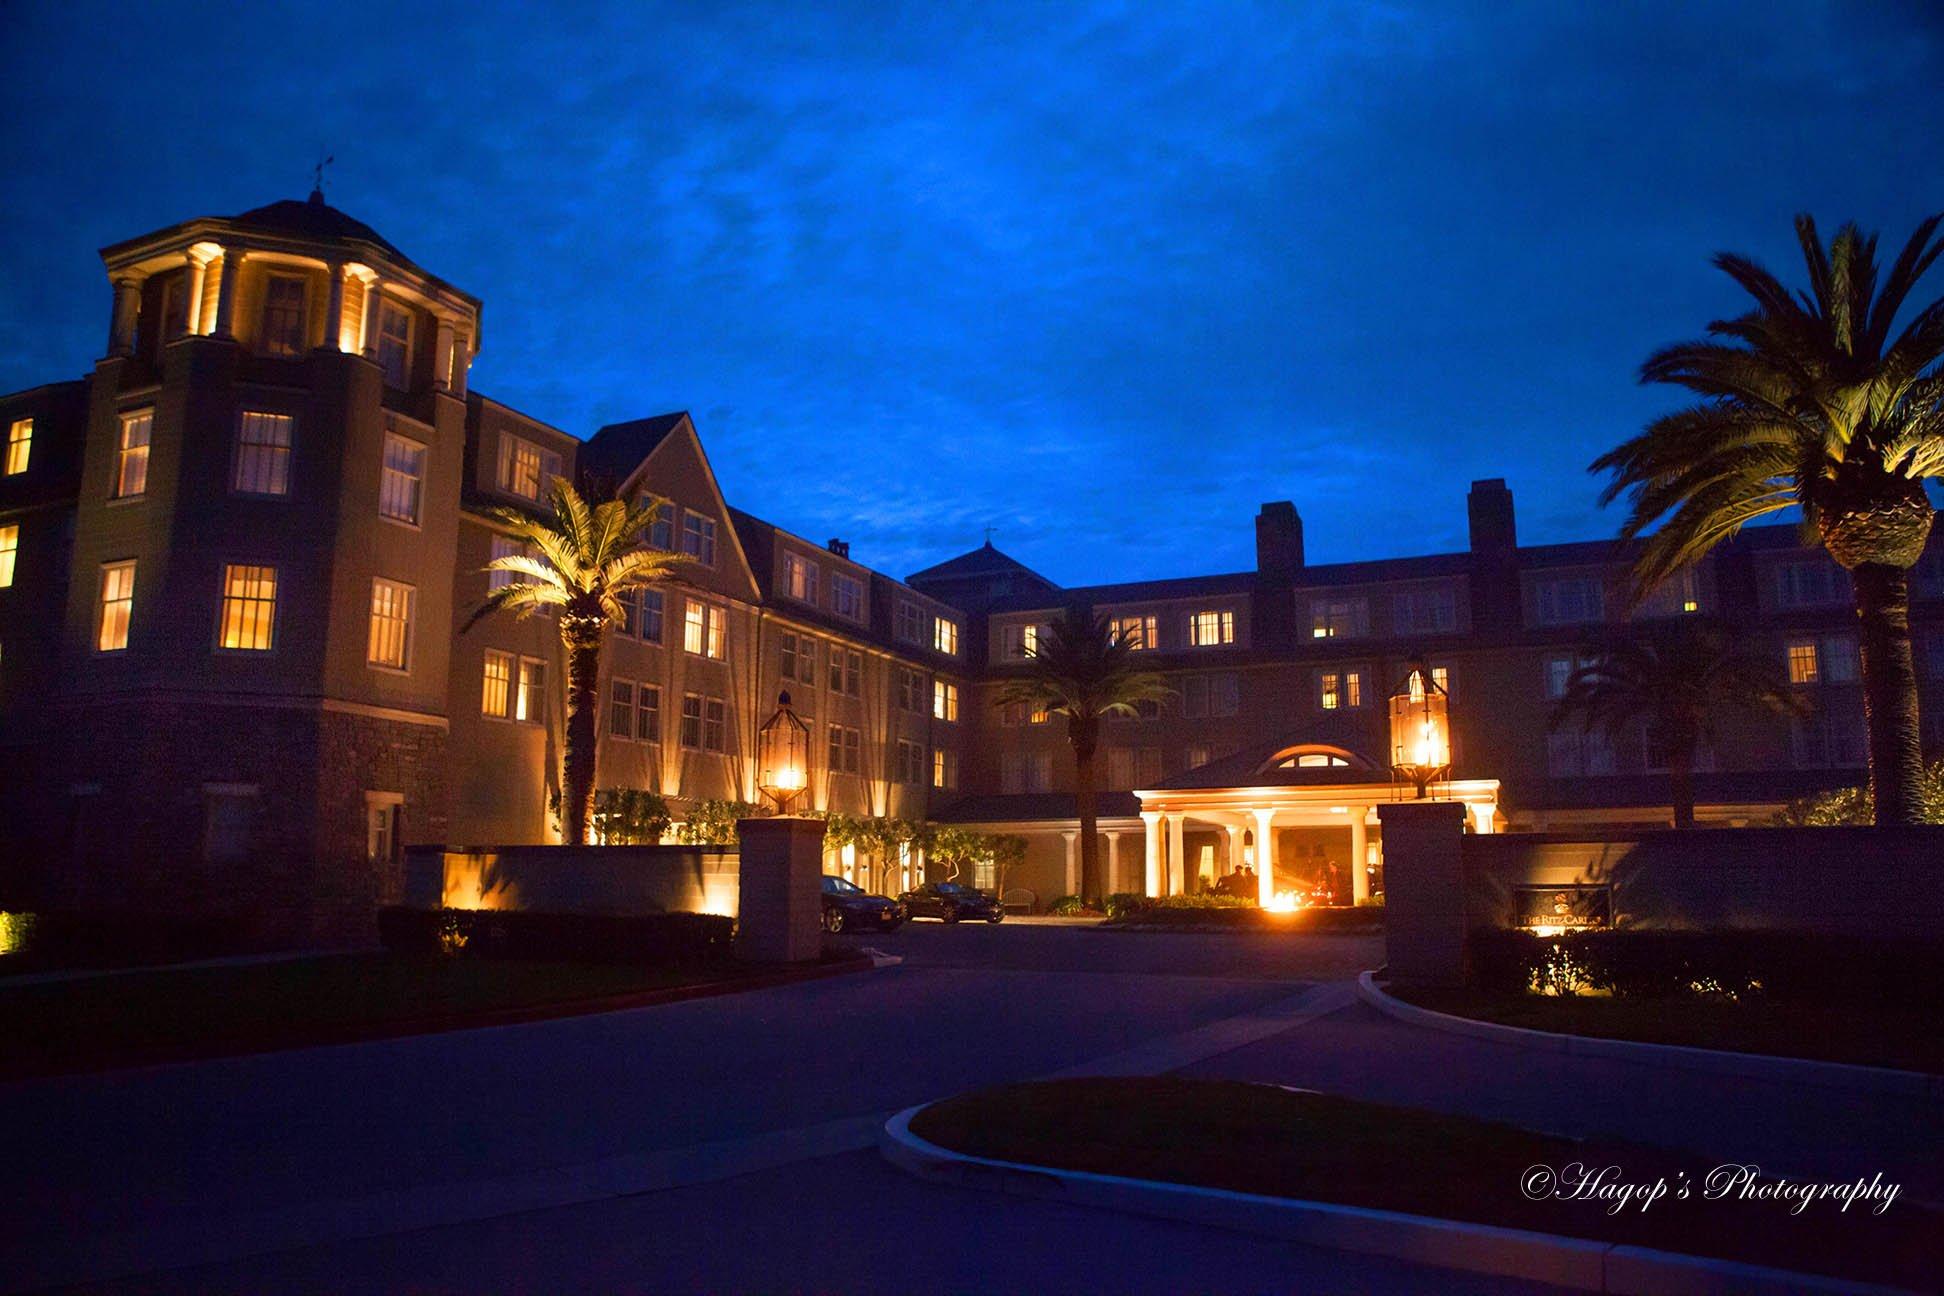 ritz carlton hotel in half moon bay night view